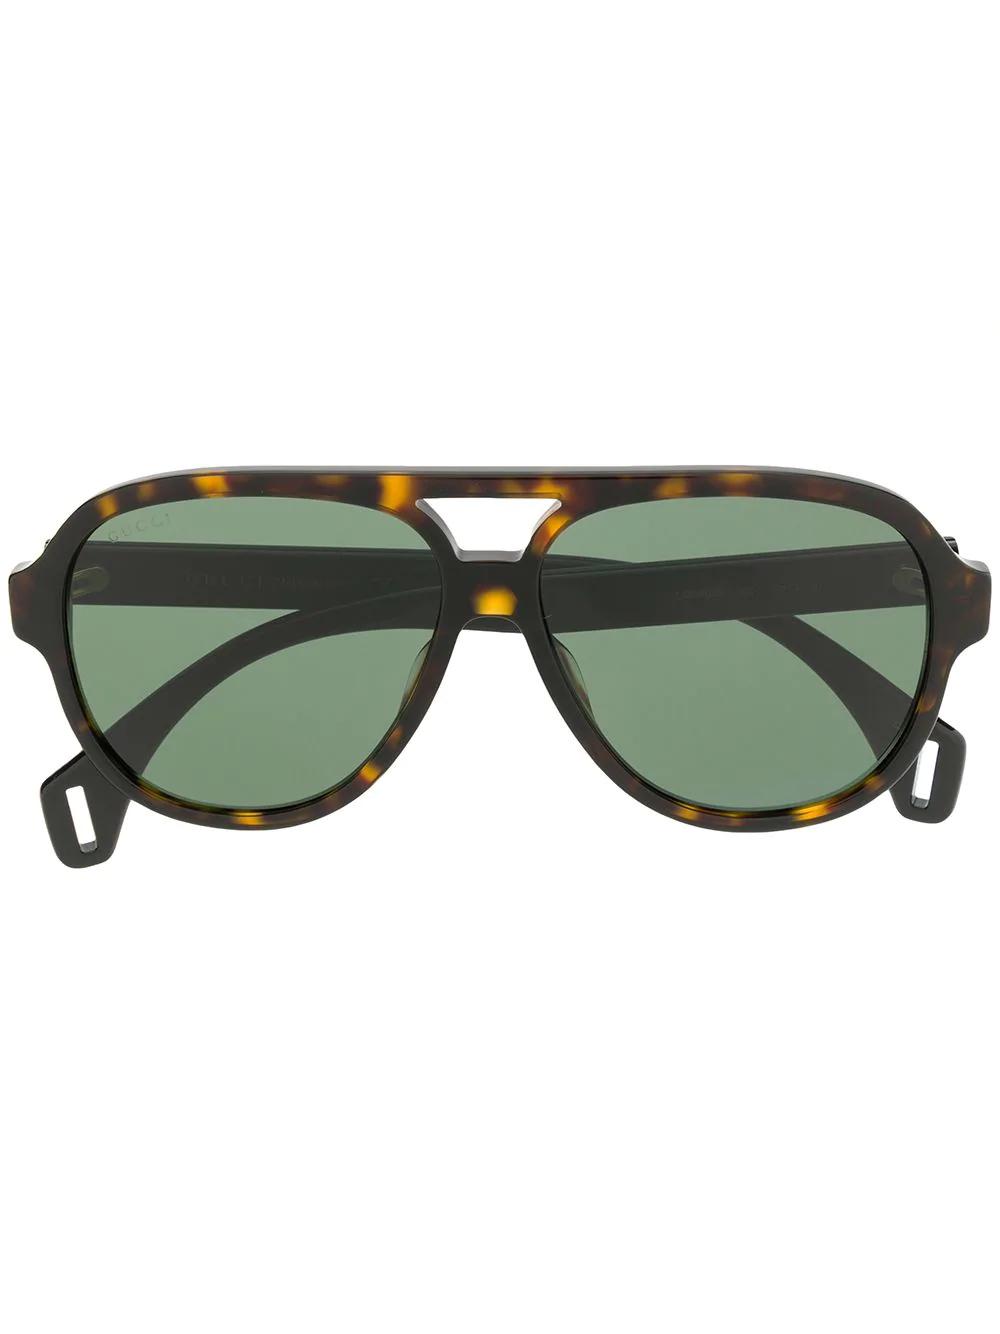 bb2a0d2f13 Gucci Eyewear Aviator Sunglasses - Brown